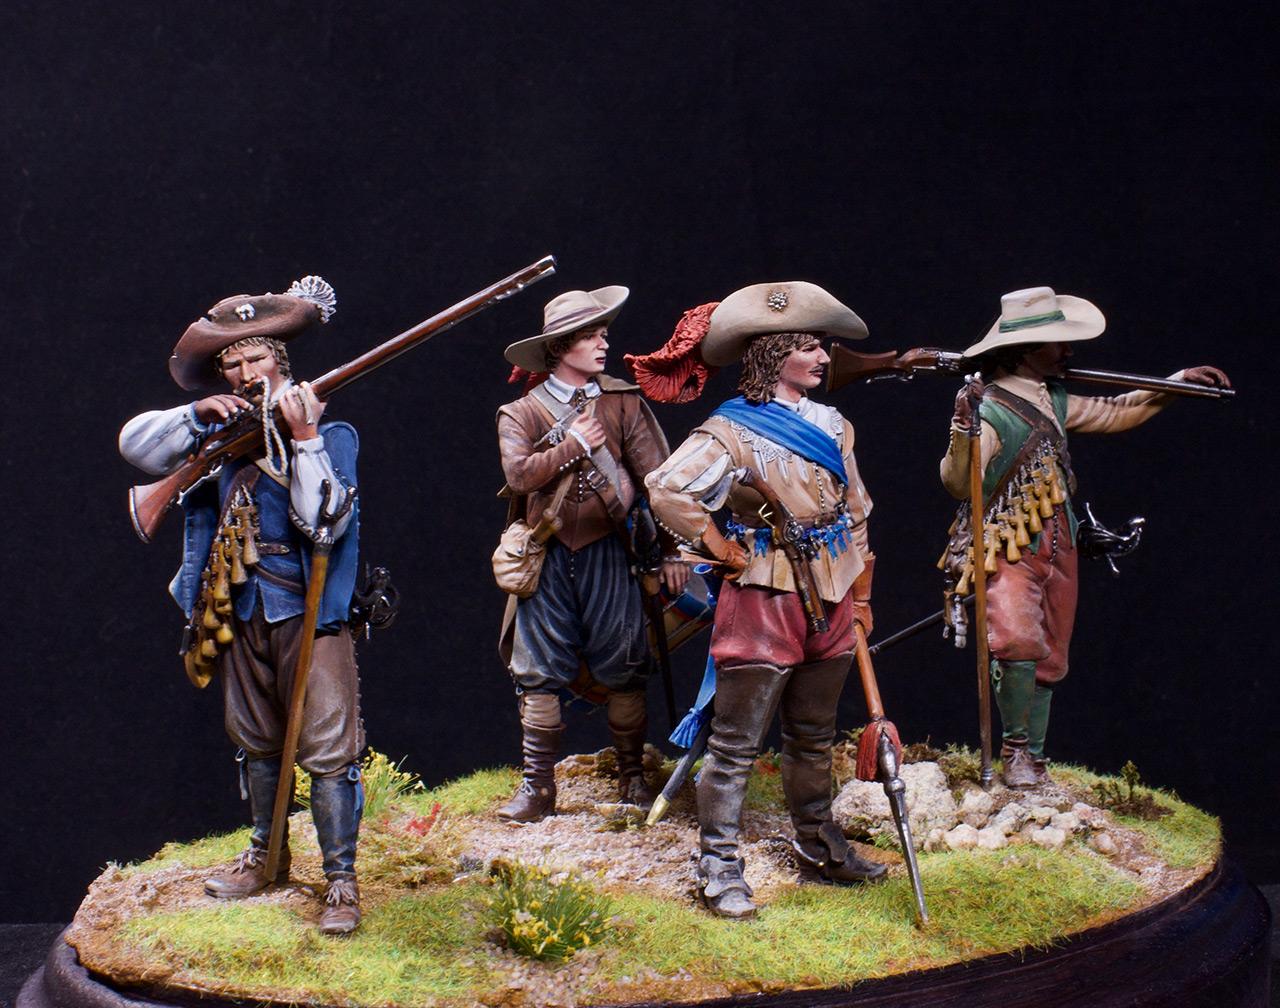 Фигурки: Мушкетеры, барабанщик и офицер, 1630 г. , фото #1